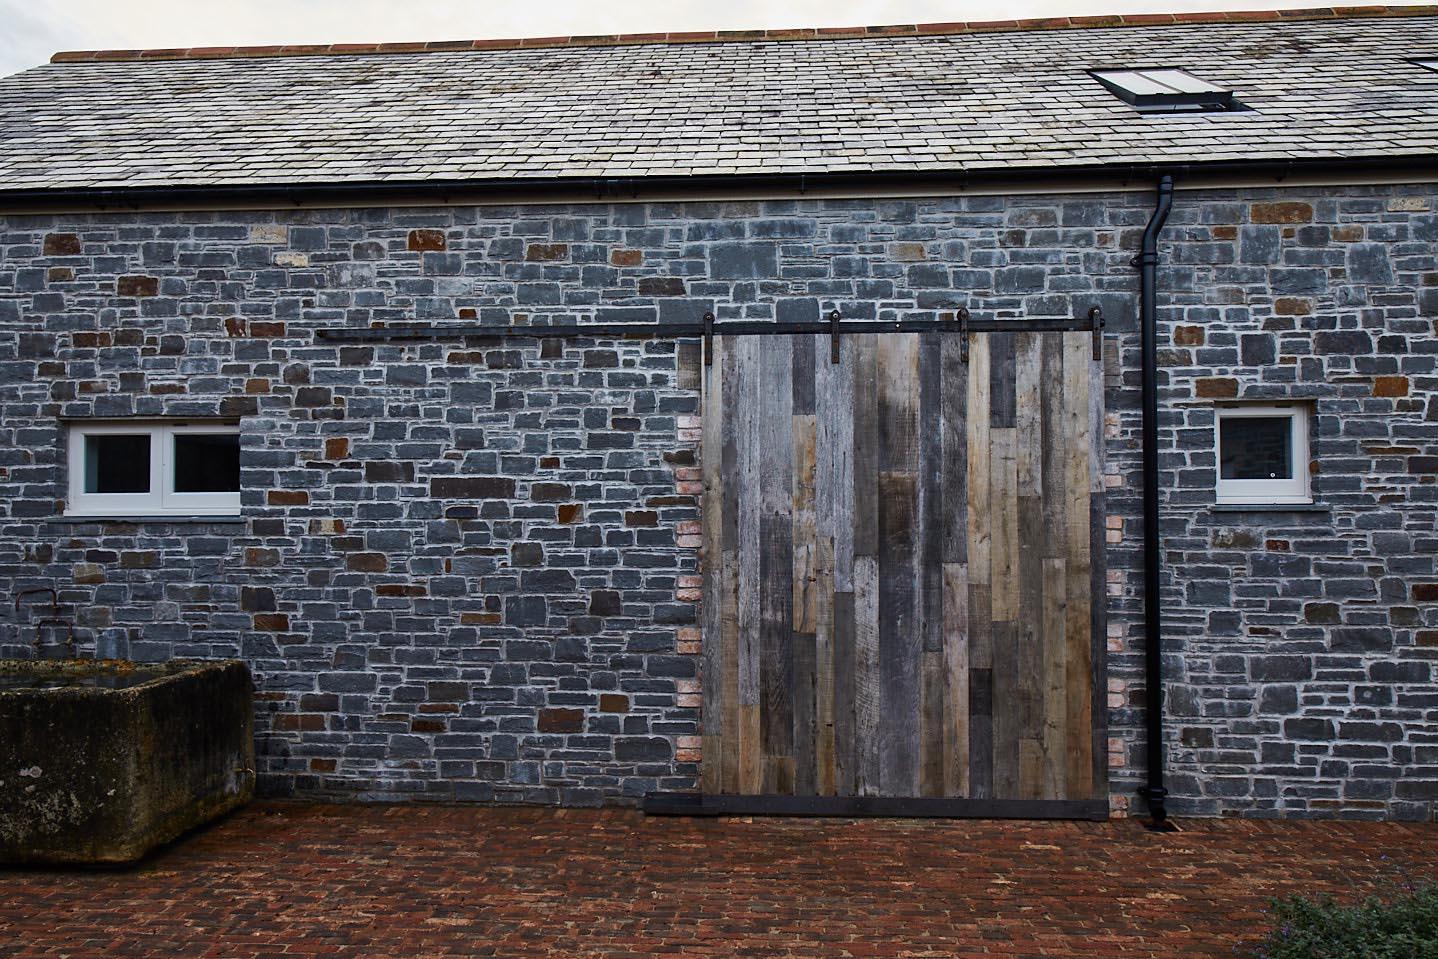 Closed external rustic pine sliding barn door against stone barn